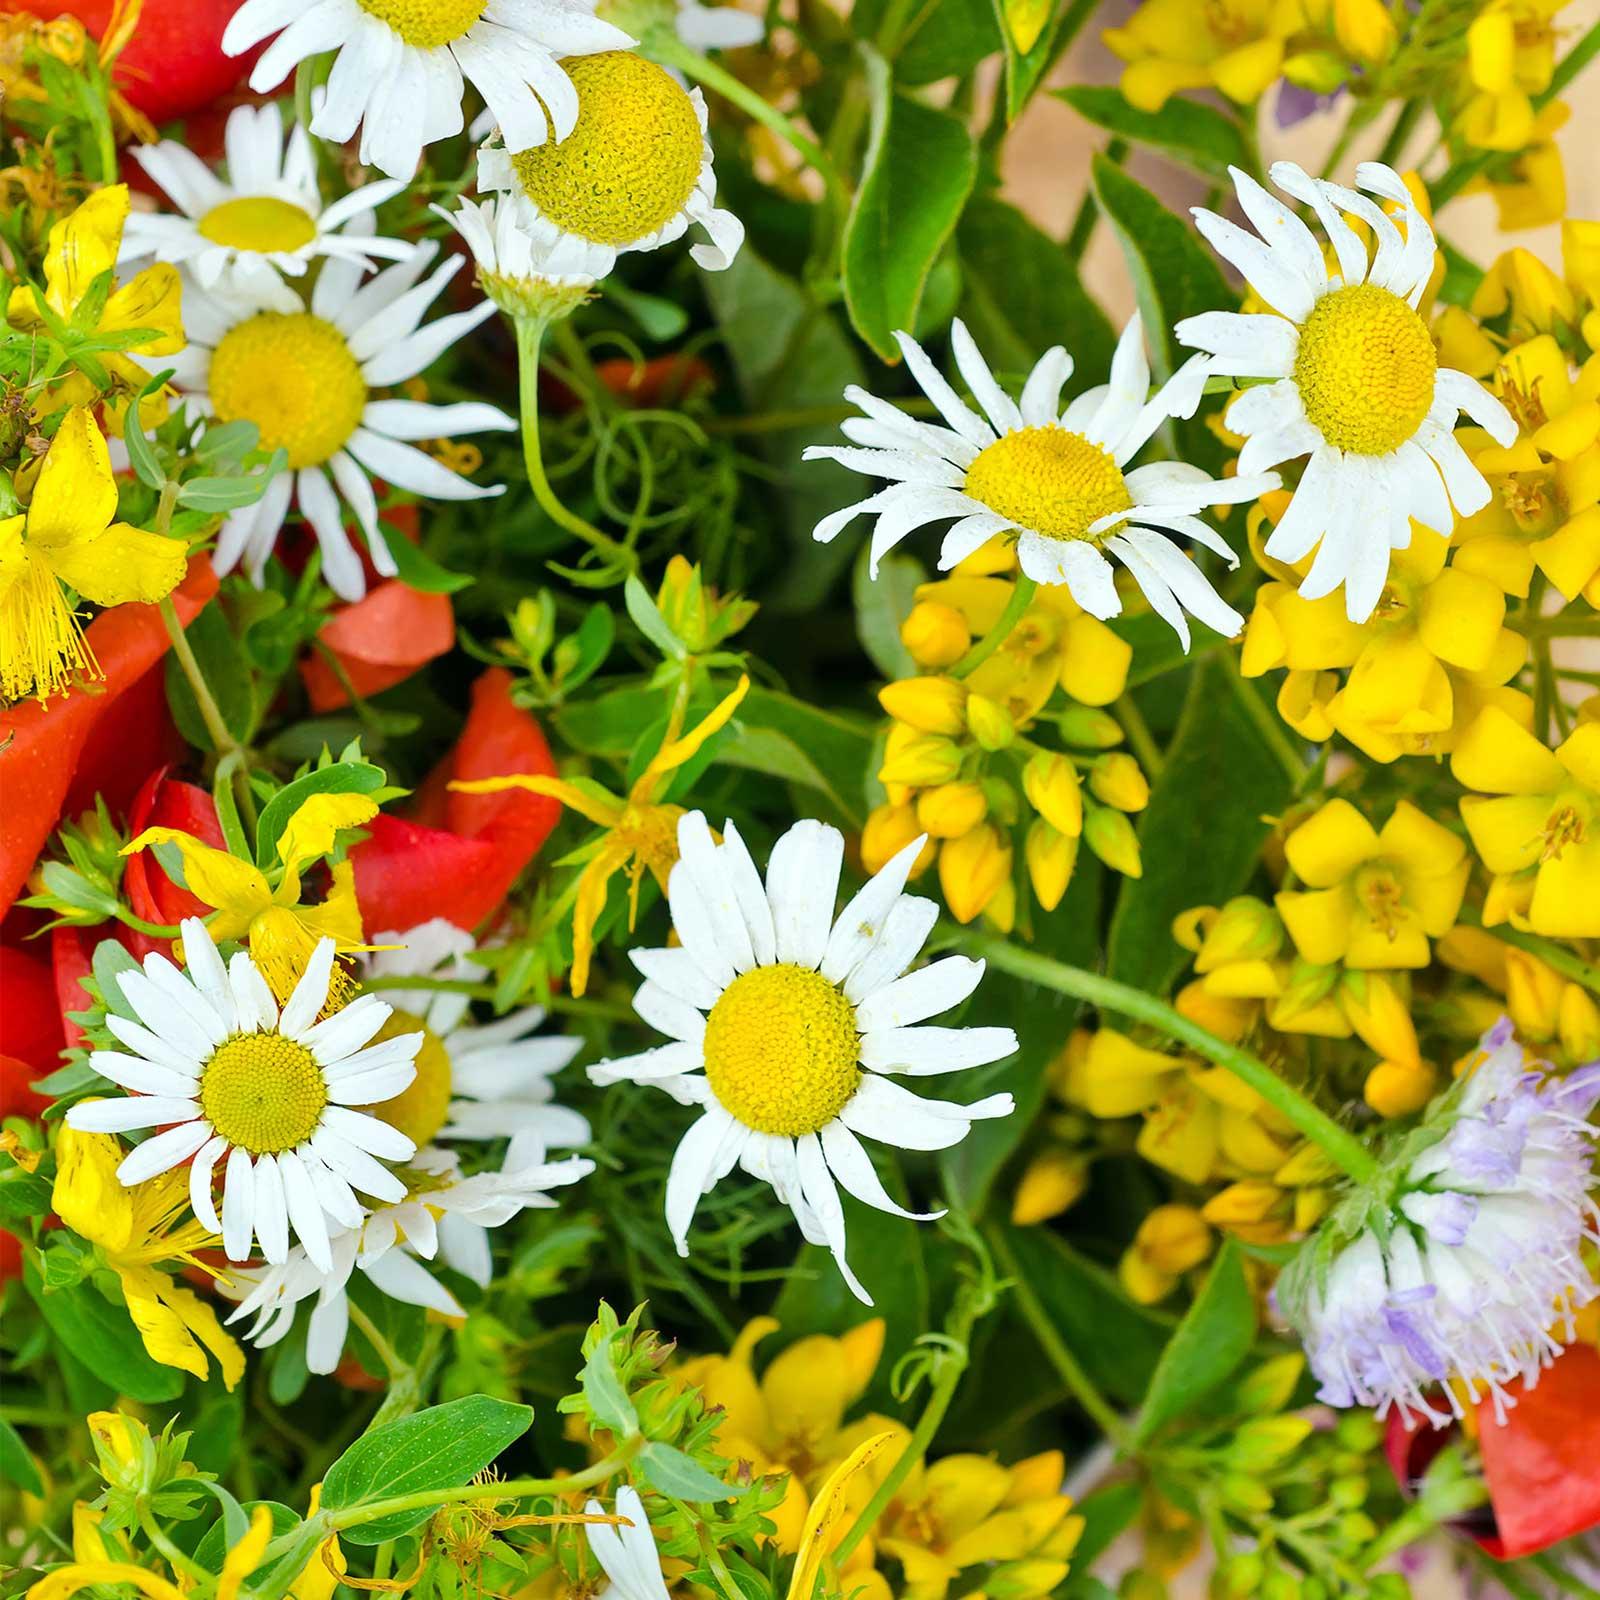 Dryland Wildflower Mix - 4 Oz - Wild Flower Garden Seed Mixture - Dry & Sunny Areas: Gloriosa Daisy, Plains Coreopsis, Coneflower, More